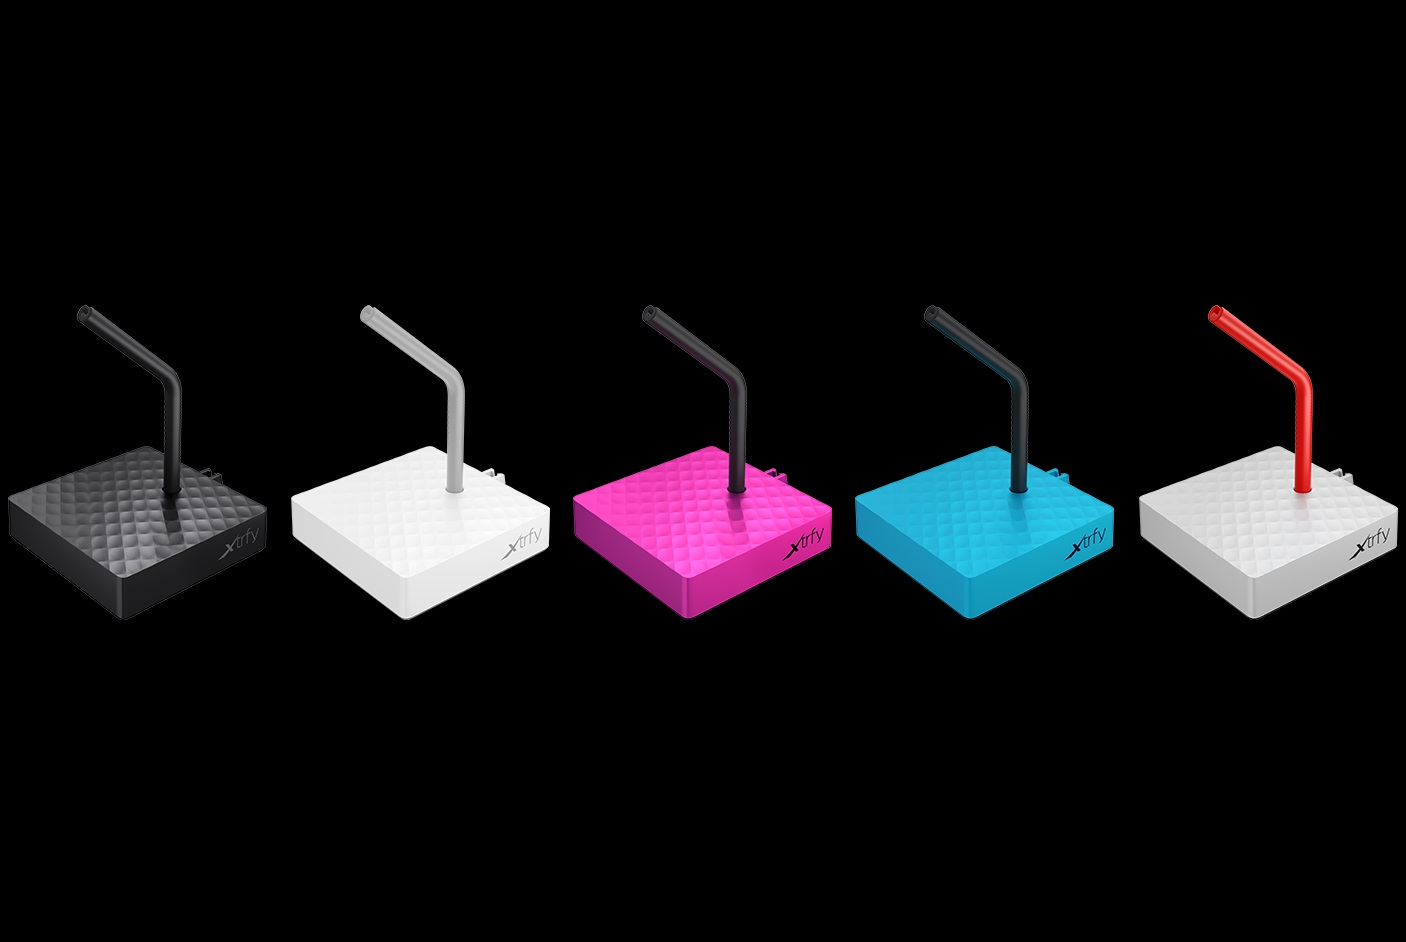 Xtrfy、5色展開の単機能マウスバンジー「Xtrfy B4」を6月26(金)に国内発売。価格は2,310円(税別)